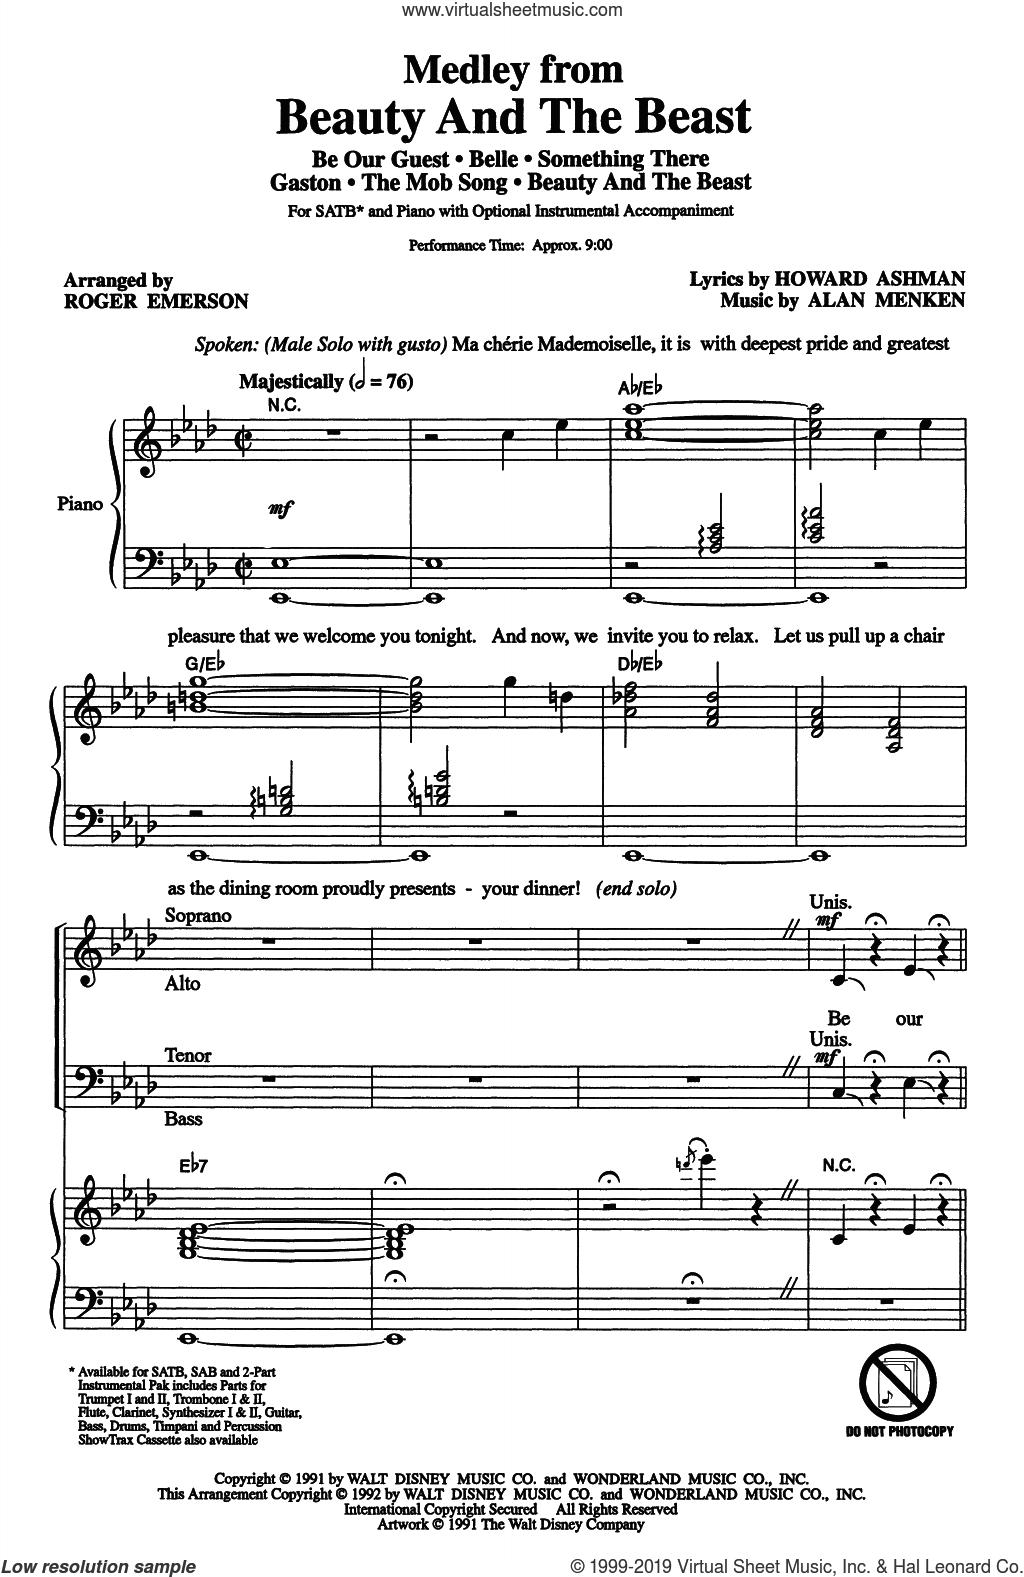 Beauty And The Beast (Medley) (arr. Roger Emerson) sheet music for choir (SATB: soprano, alto, tenor, bass) by Alan Menken, Roger Emerson, Alan Menken & Howard Ashman and Howard Ashman, intermediate skill level